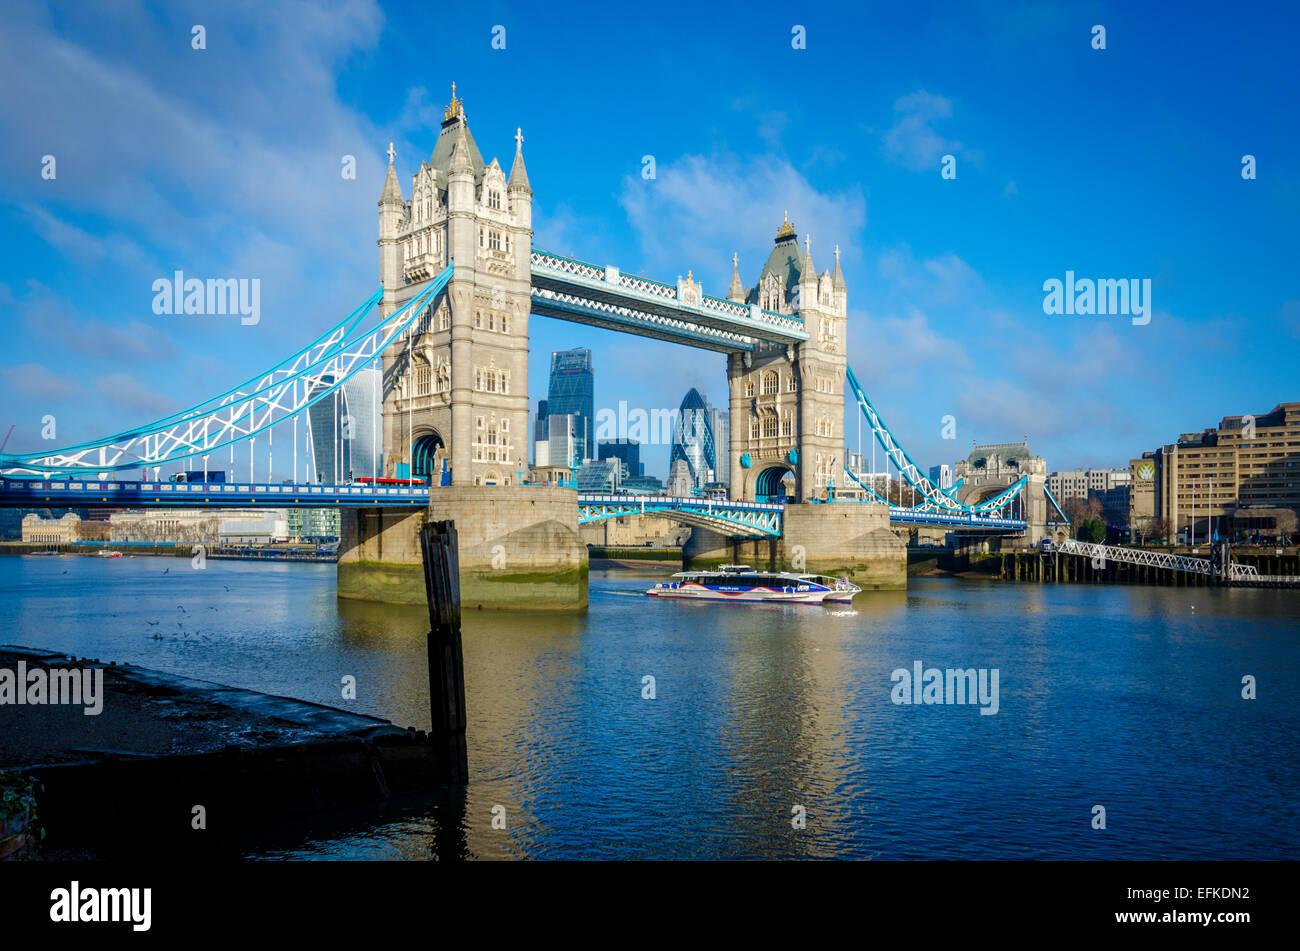 Tower Bridge, London, UK Photo Stock